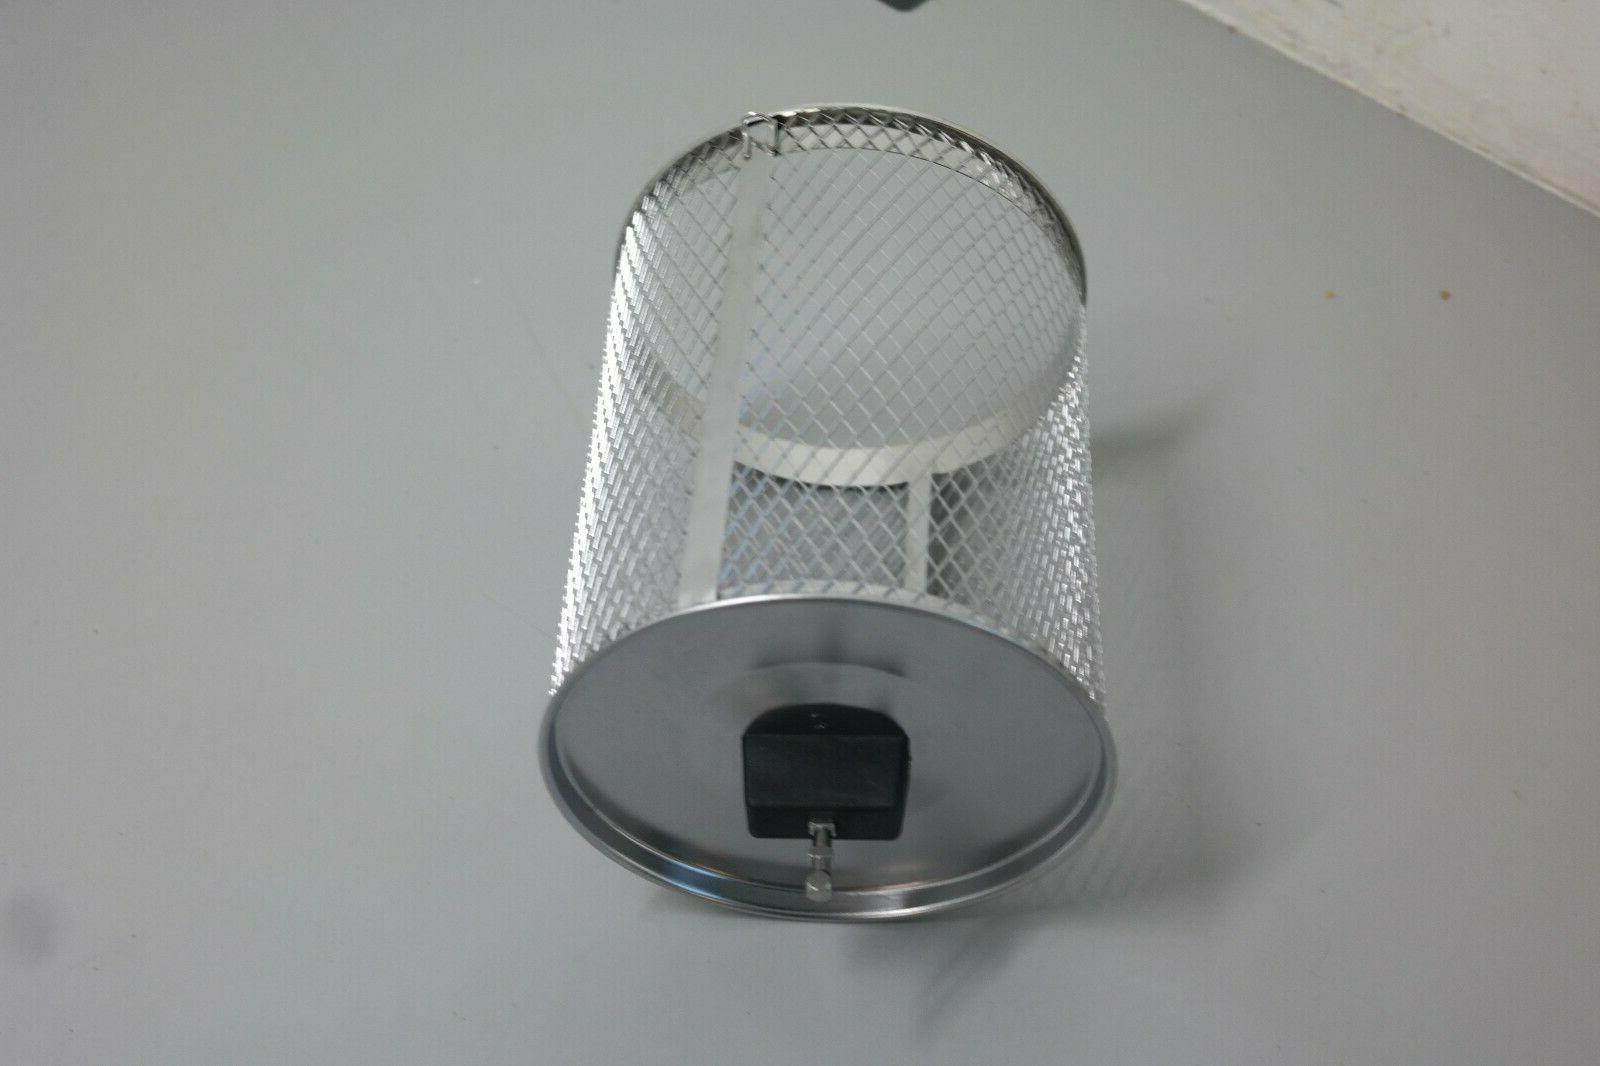 OEM Rotisserie Cage Parts FOR PLUS 7in1 AIR